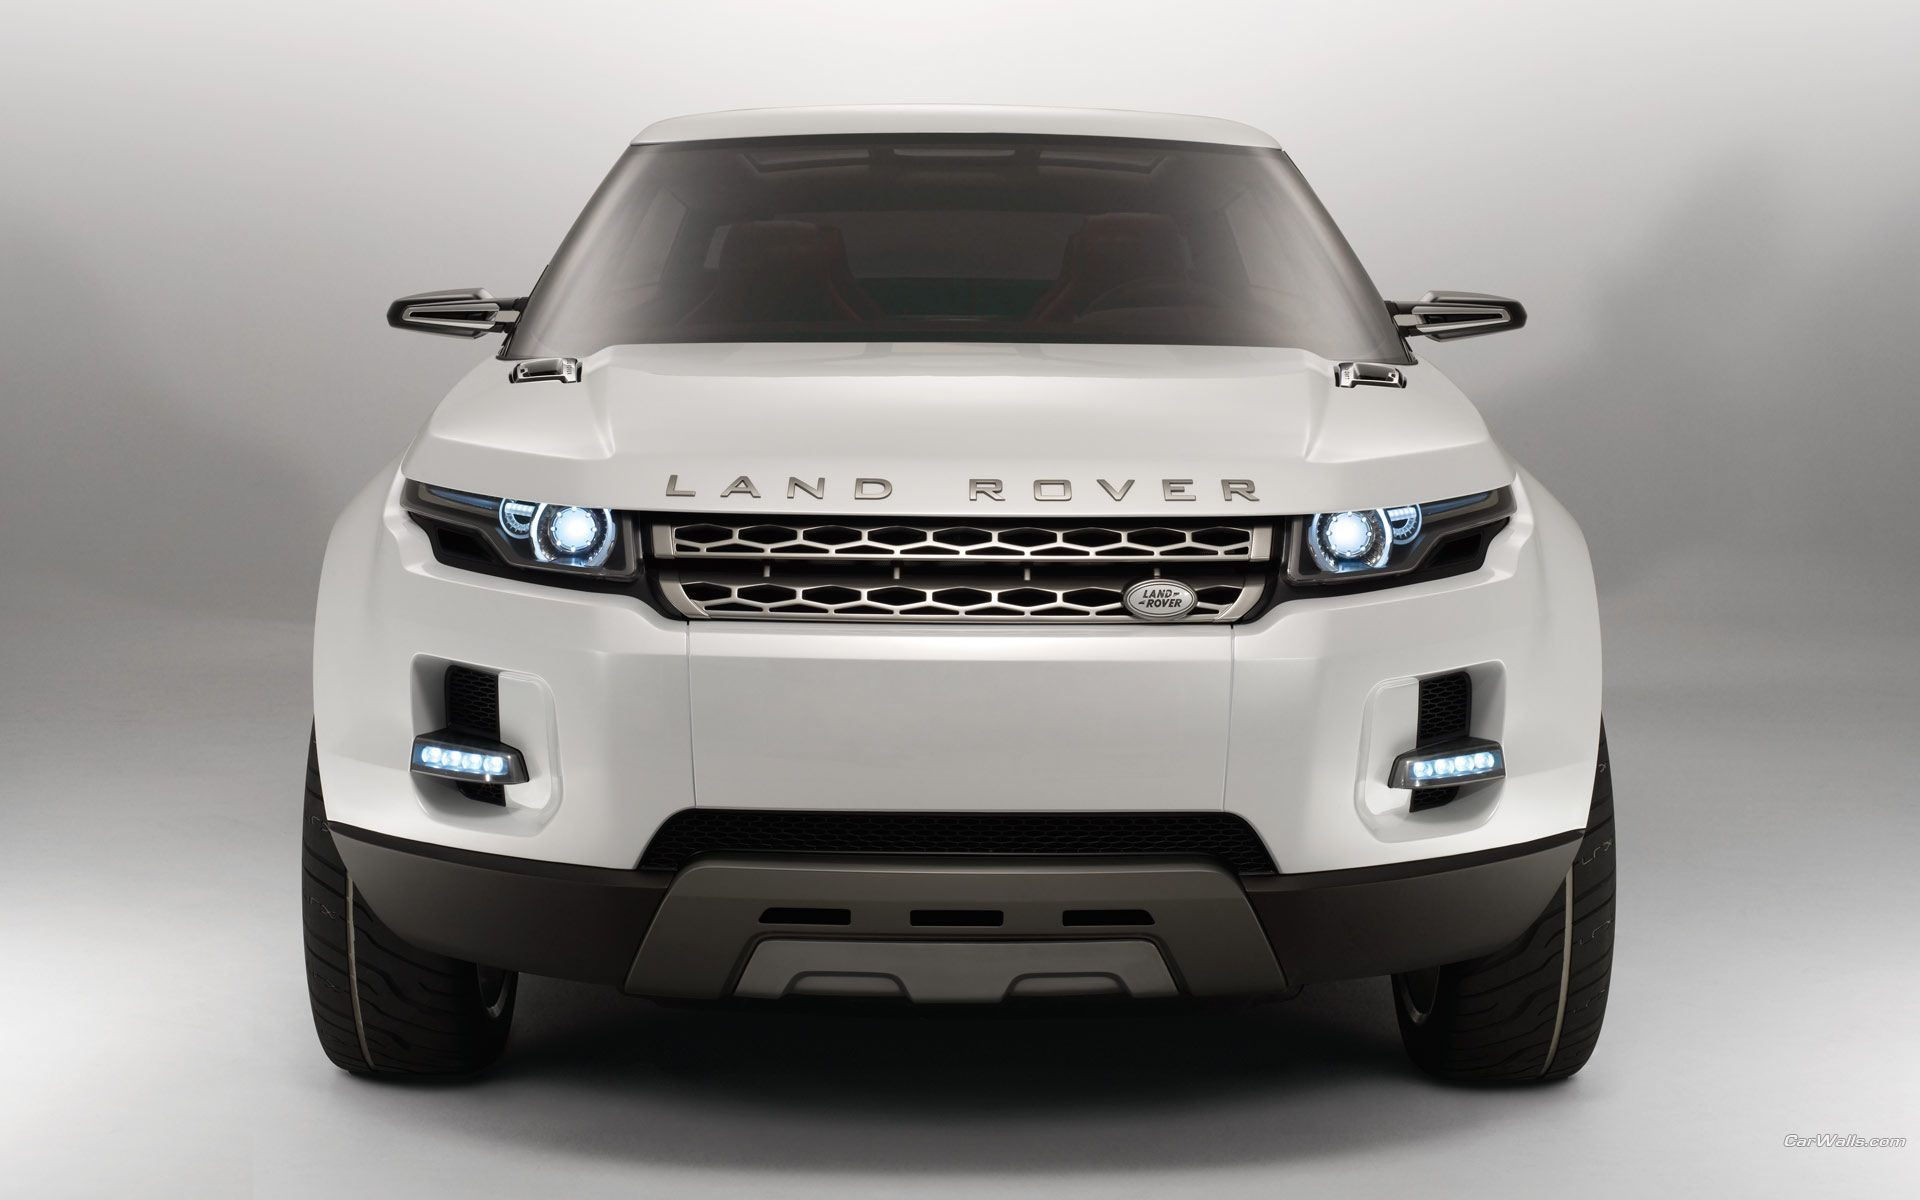 Rastar Land Rover Evoque 12v With Remote Control White Land